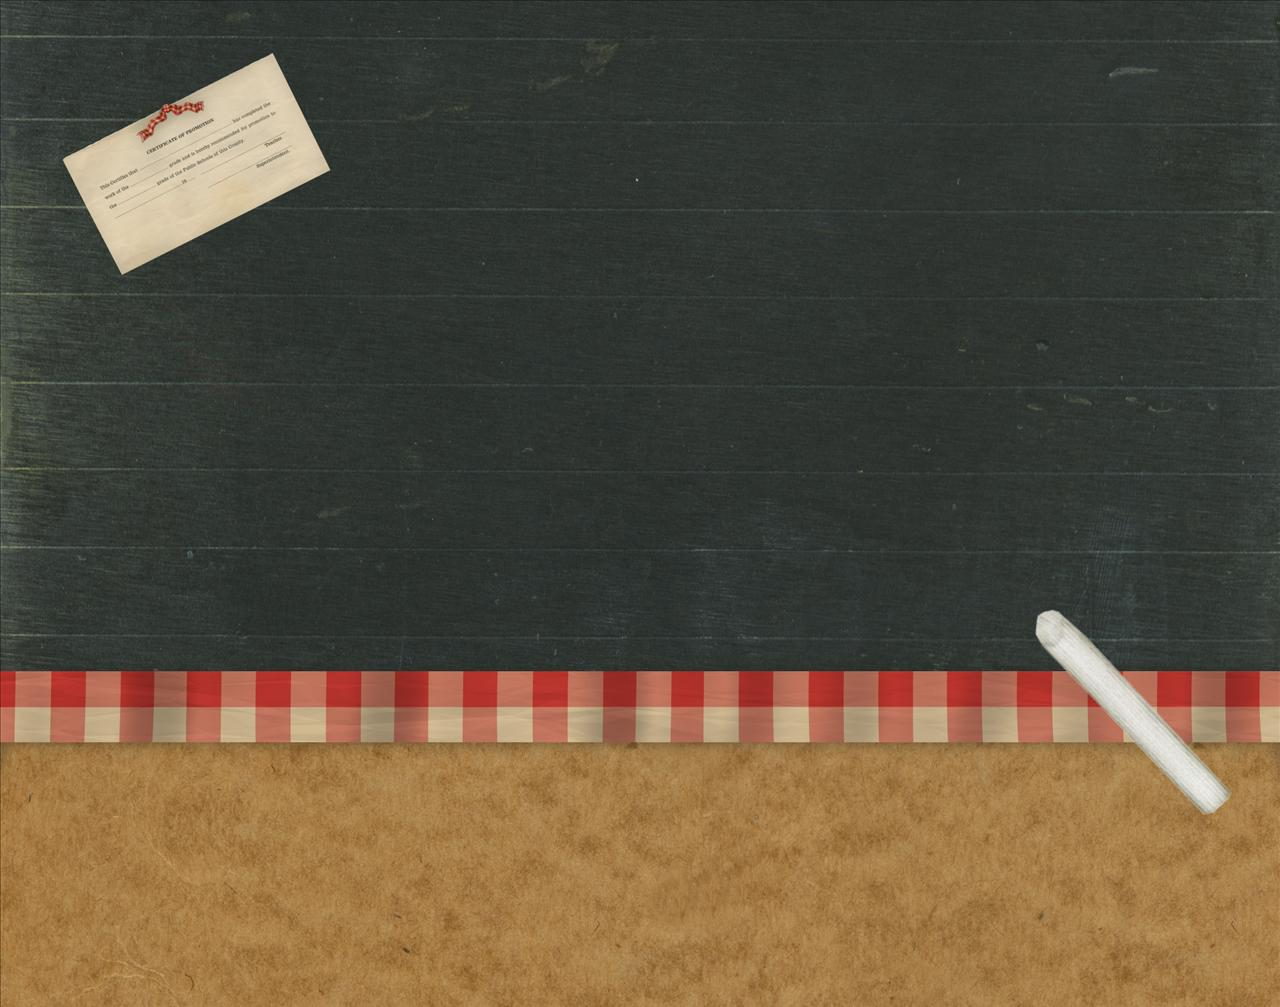 Vintage Schoolhouse Teacher Backgrounds For PowerPoint   Border 1280x1007